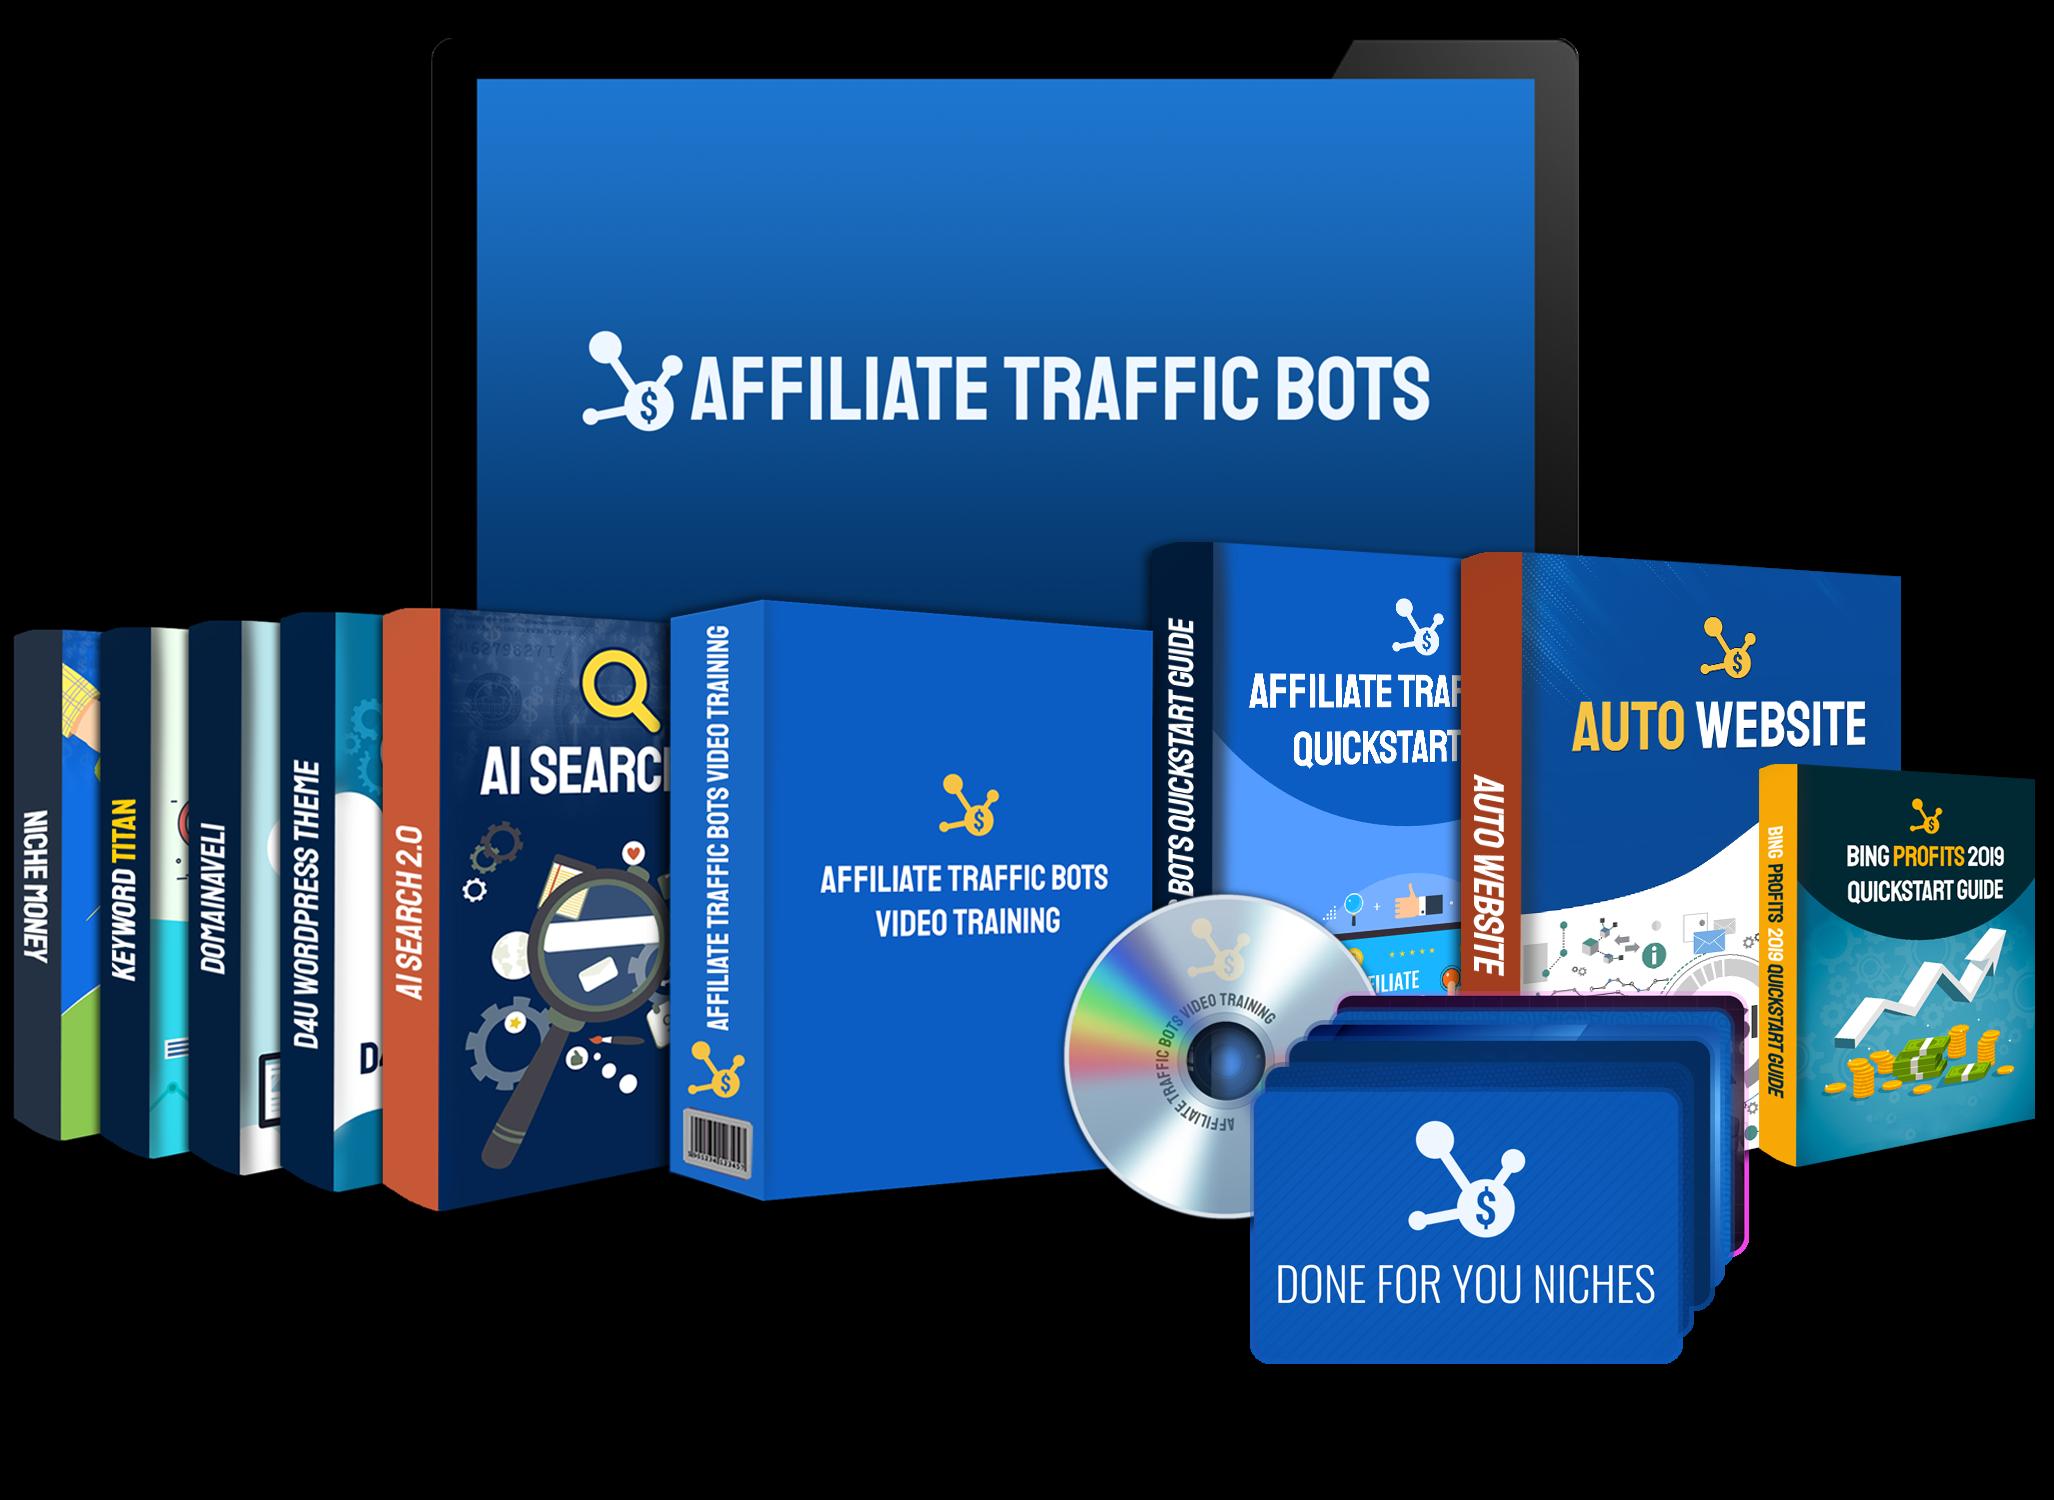 WEBSITE TRAFFIC BOT SOFTWARE | MARKETING FOR AN ONLINE BUSINESS